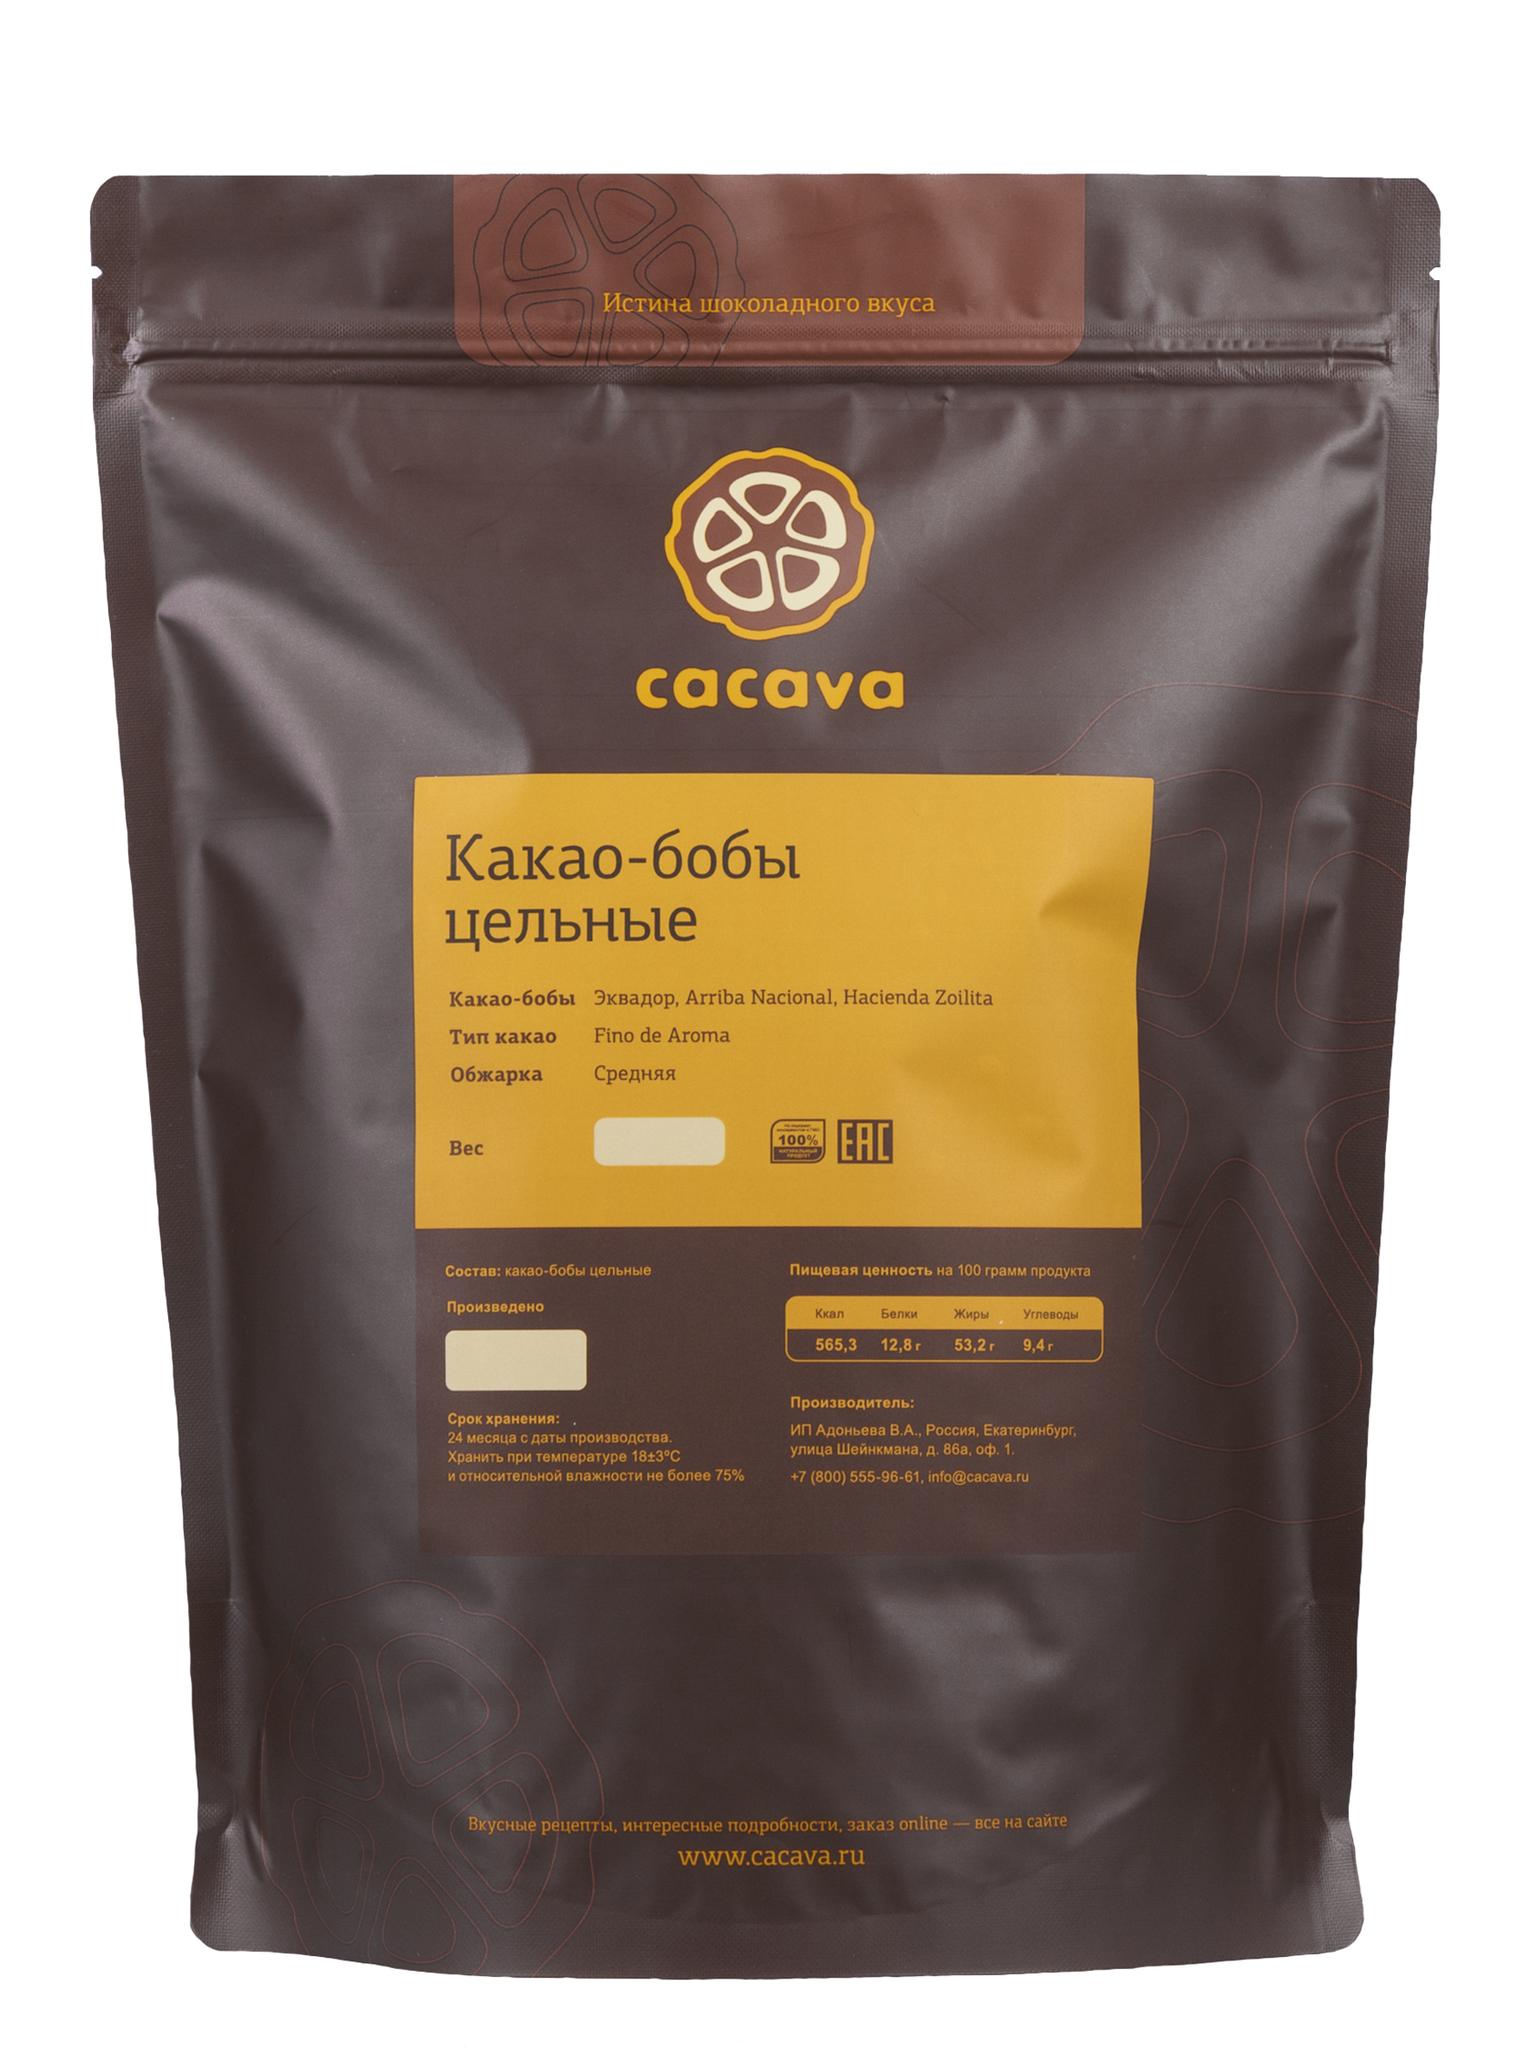 Какао-бобы цельные (Эквадор), упаковка 1 кг